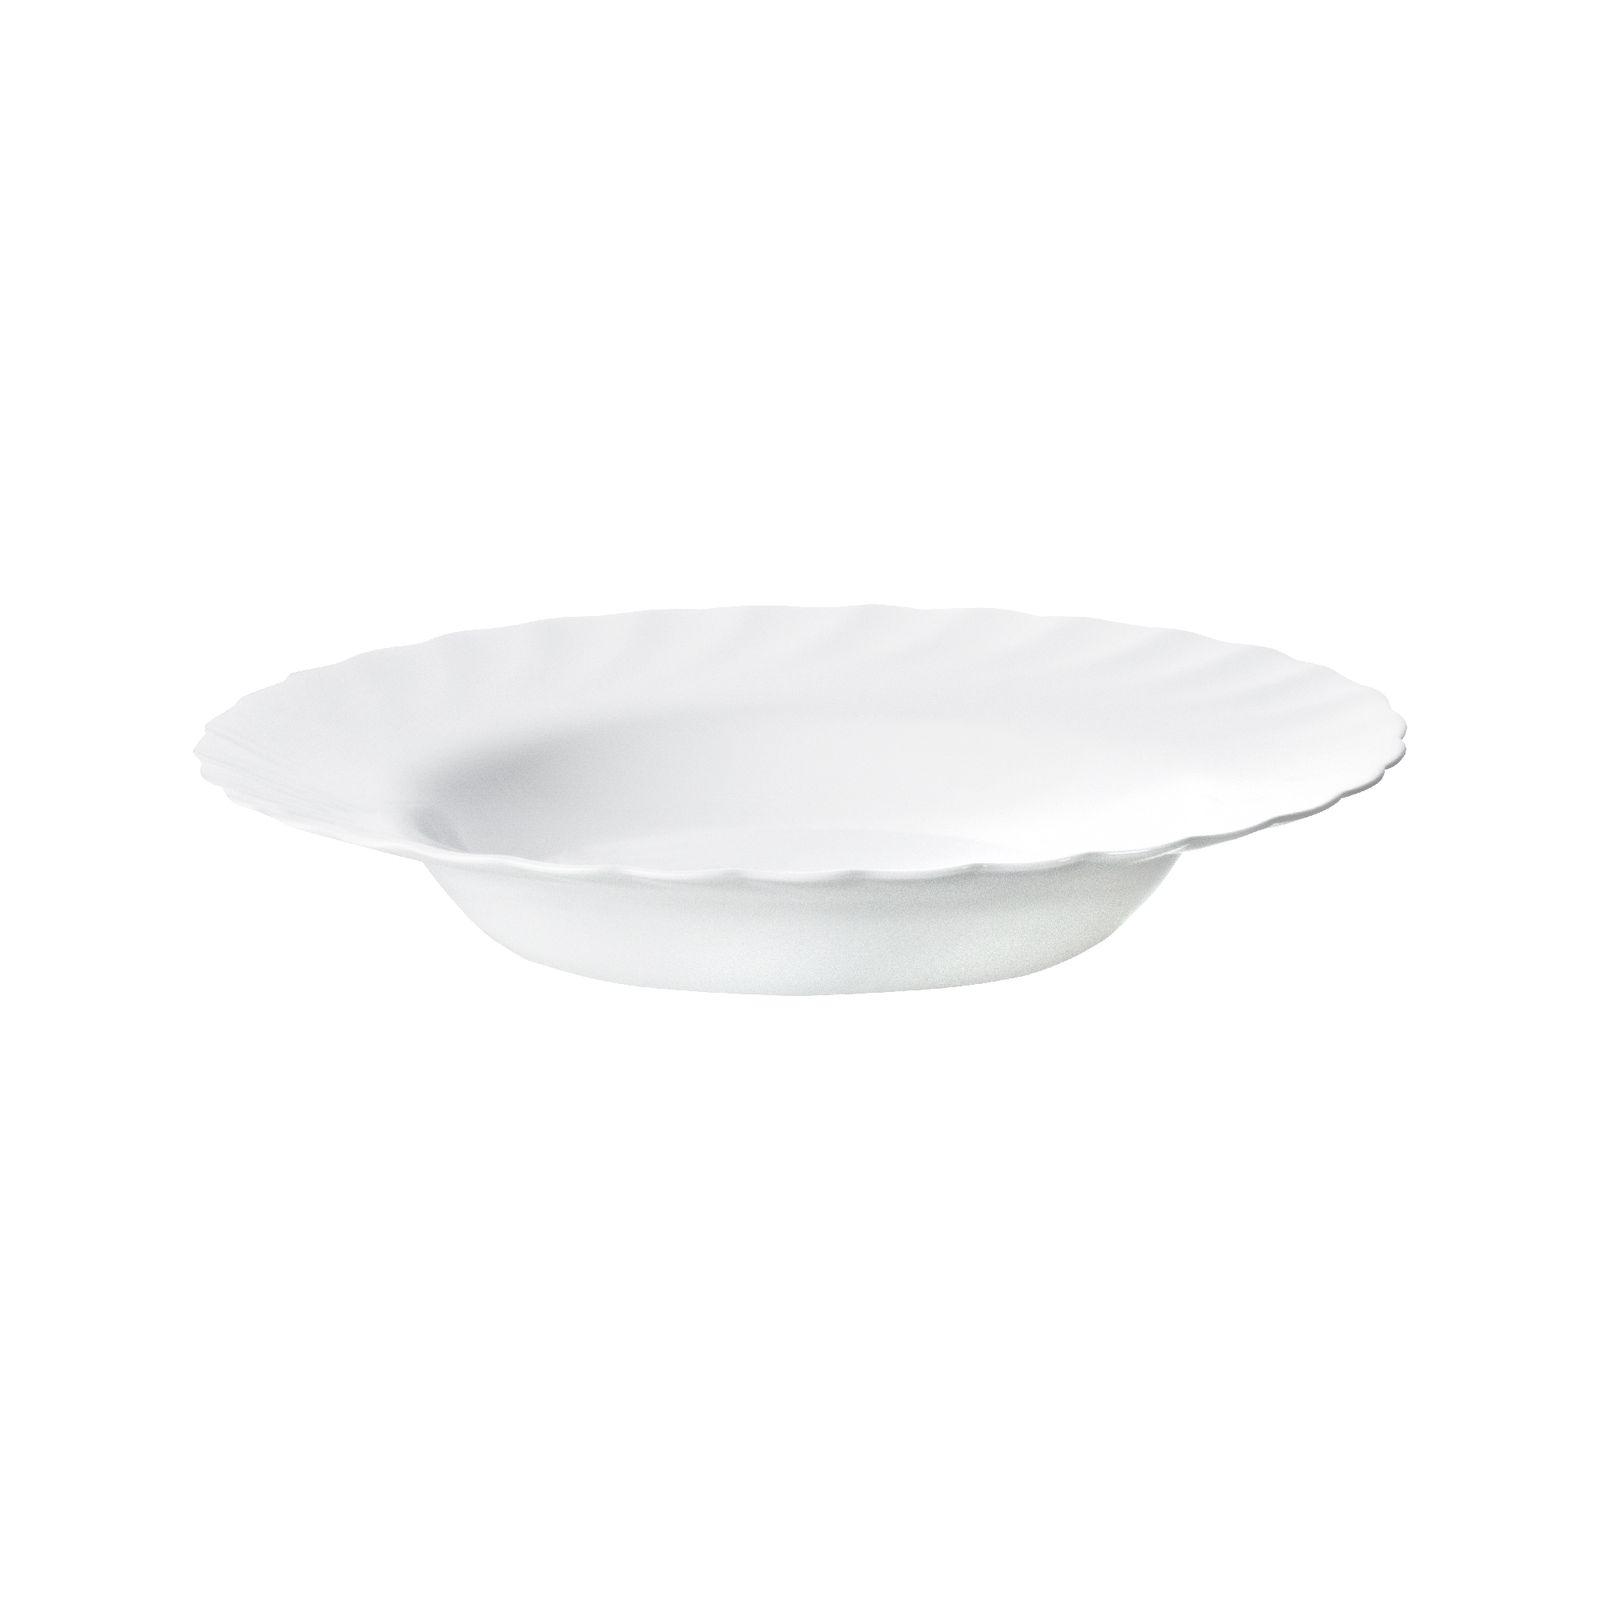 Assiette creuse Trianon 22,5 cm LUMINARC